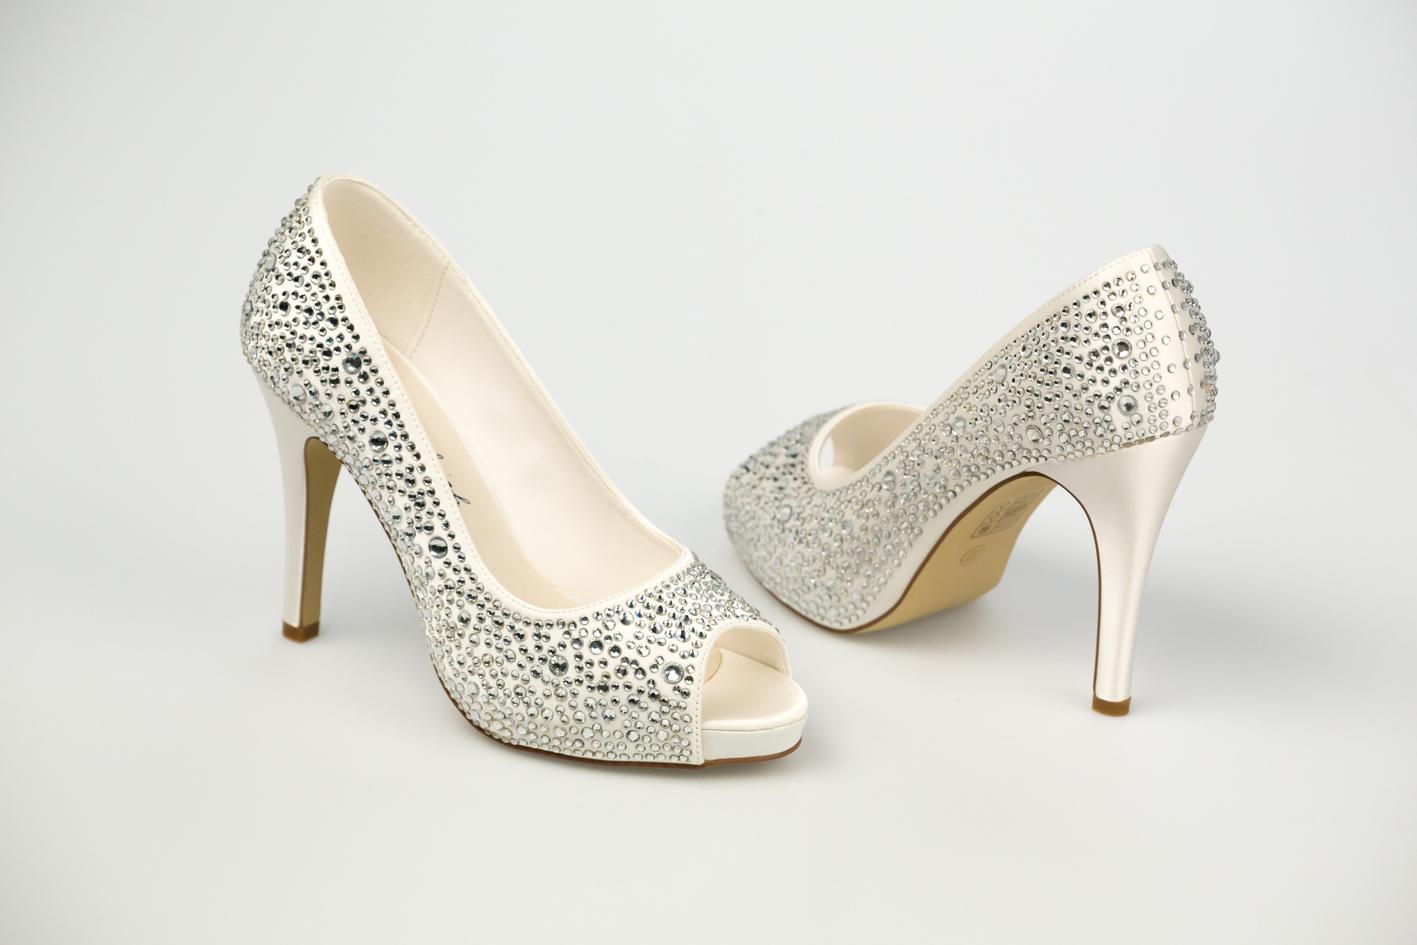 Svadobné topánky Roxanne - Obrázok č. 4